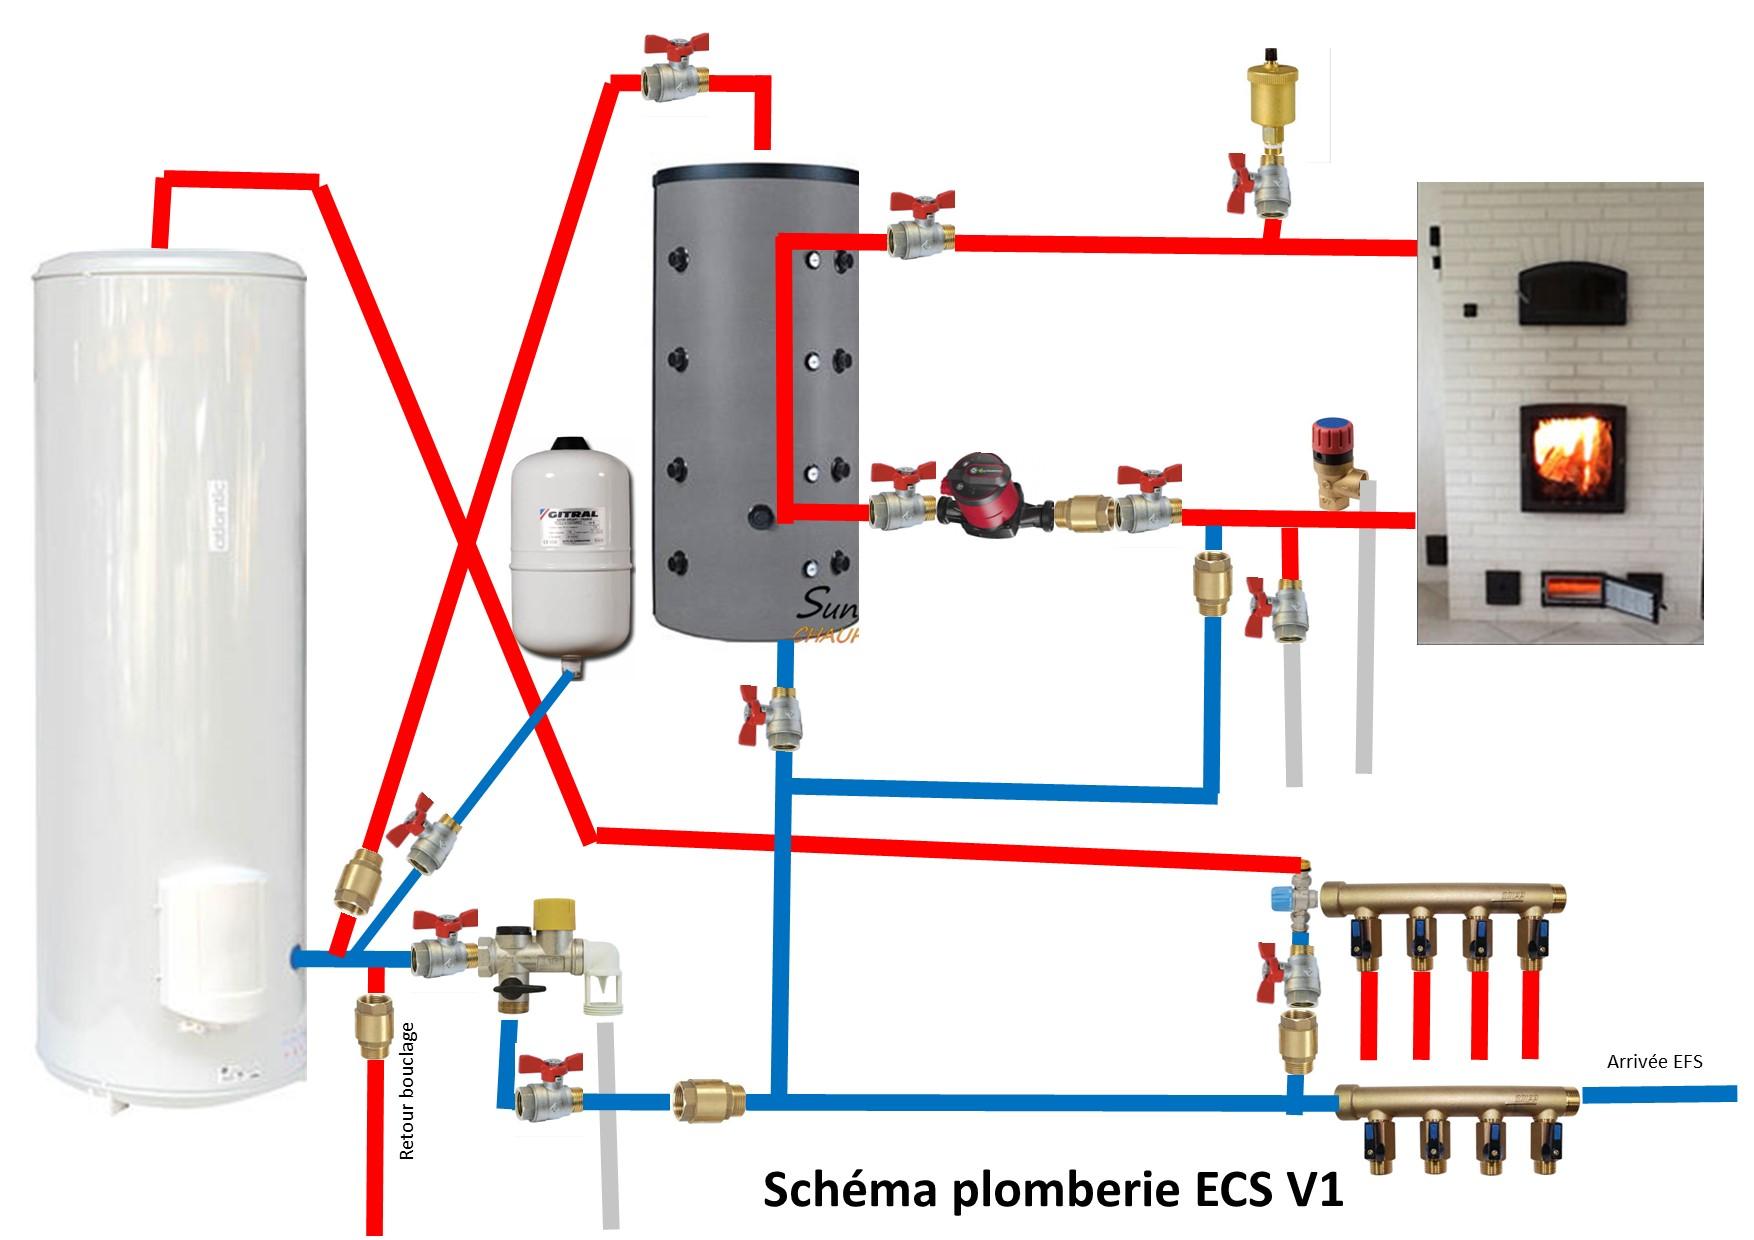 Schema plomberie ECS.jpg, 222.67 kb, 1754 x 1240